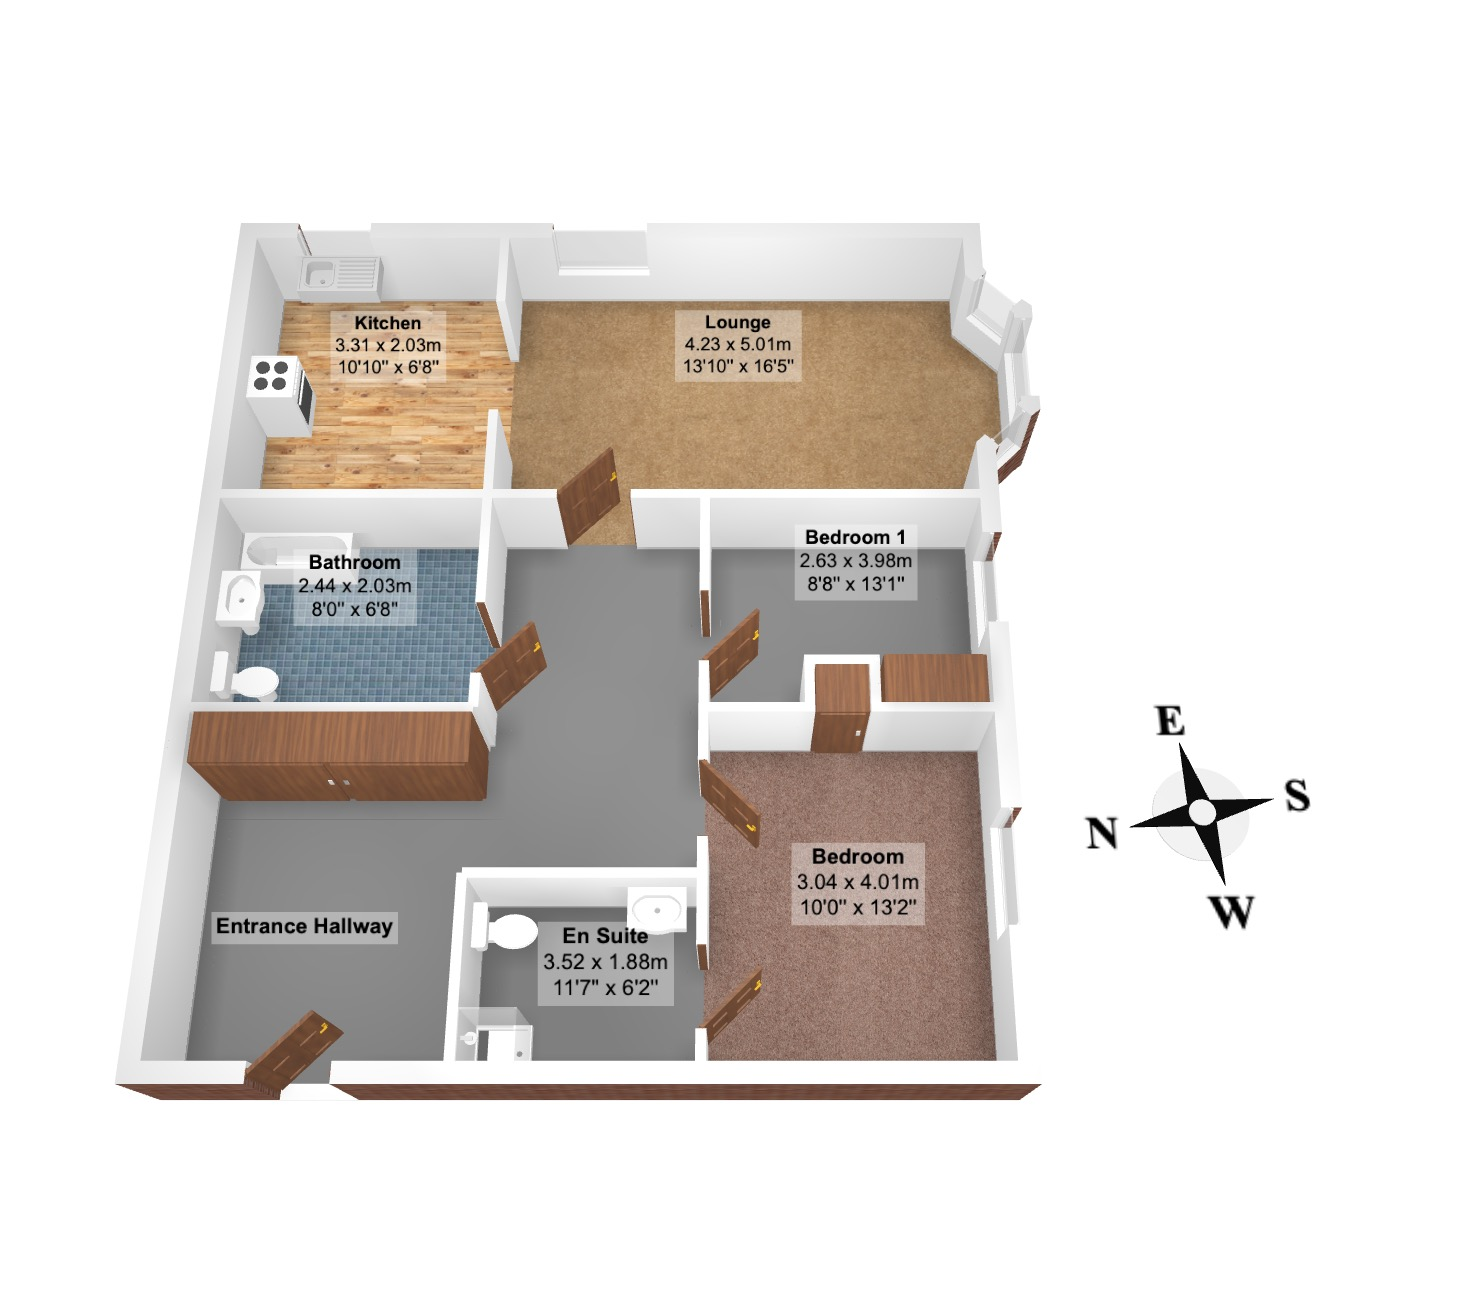 10 Morrel House Floorplan